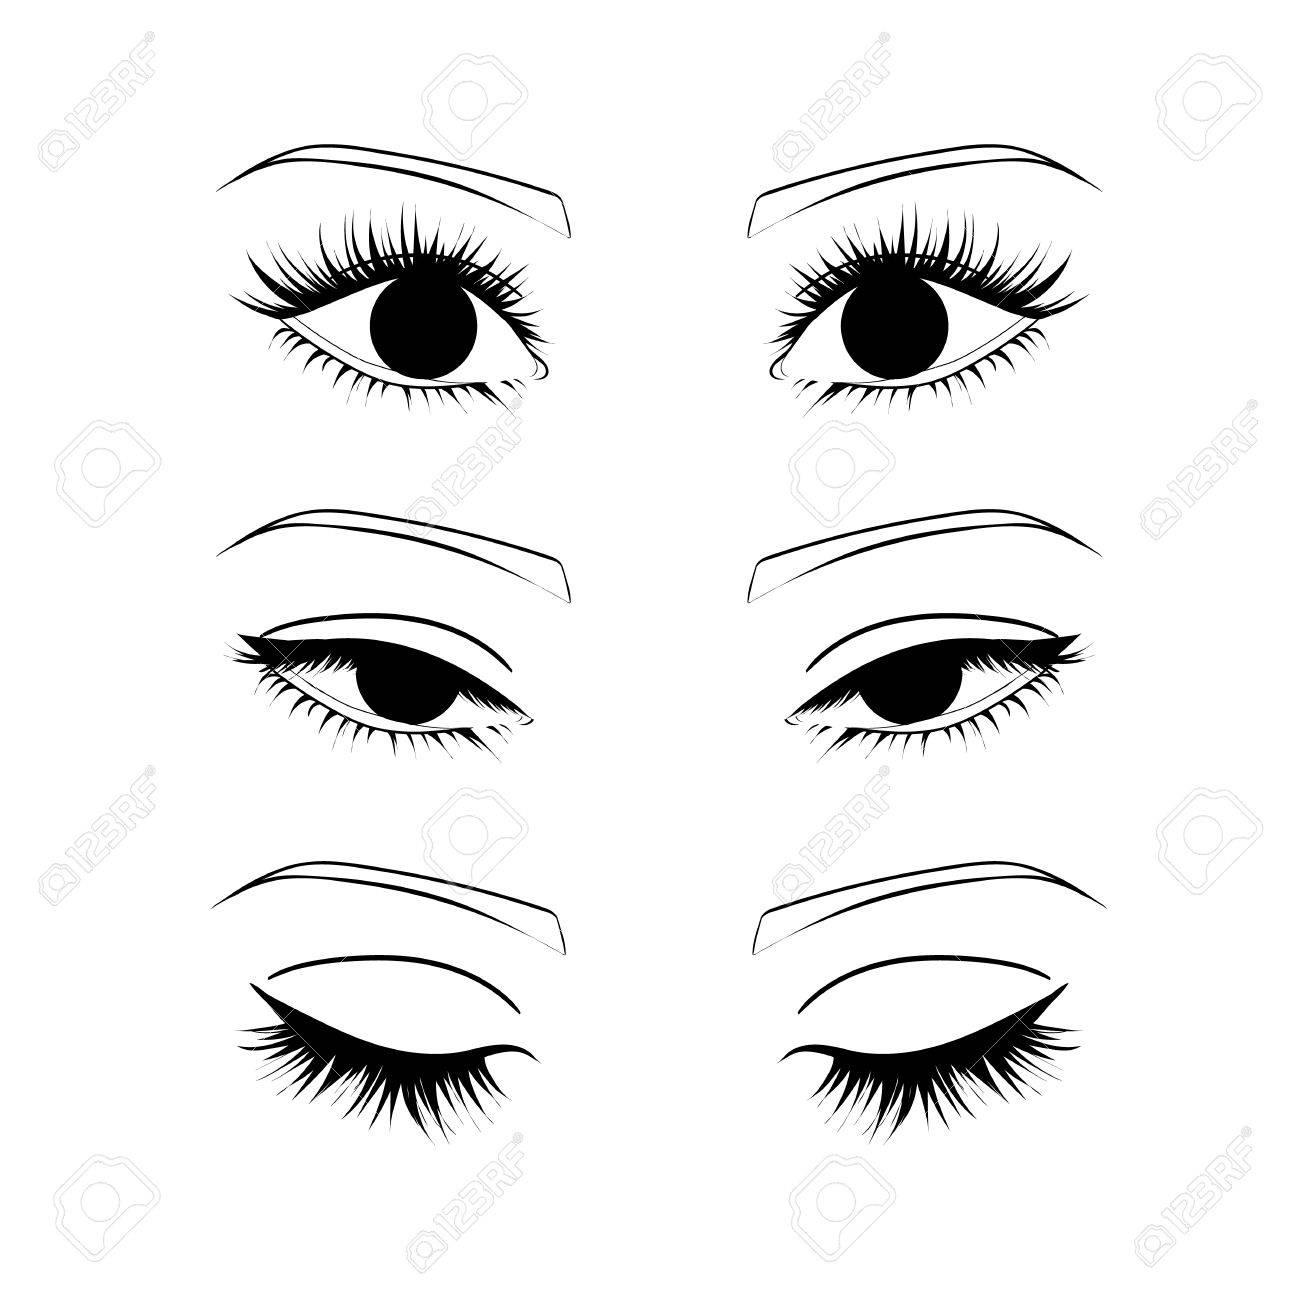 Female eyes outline. open, closed half-open eyes - 61119100